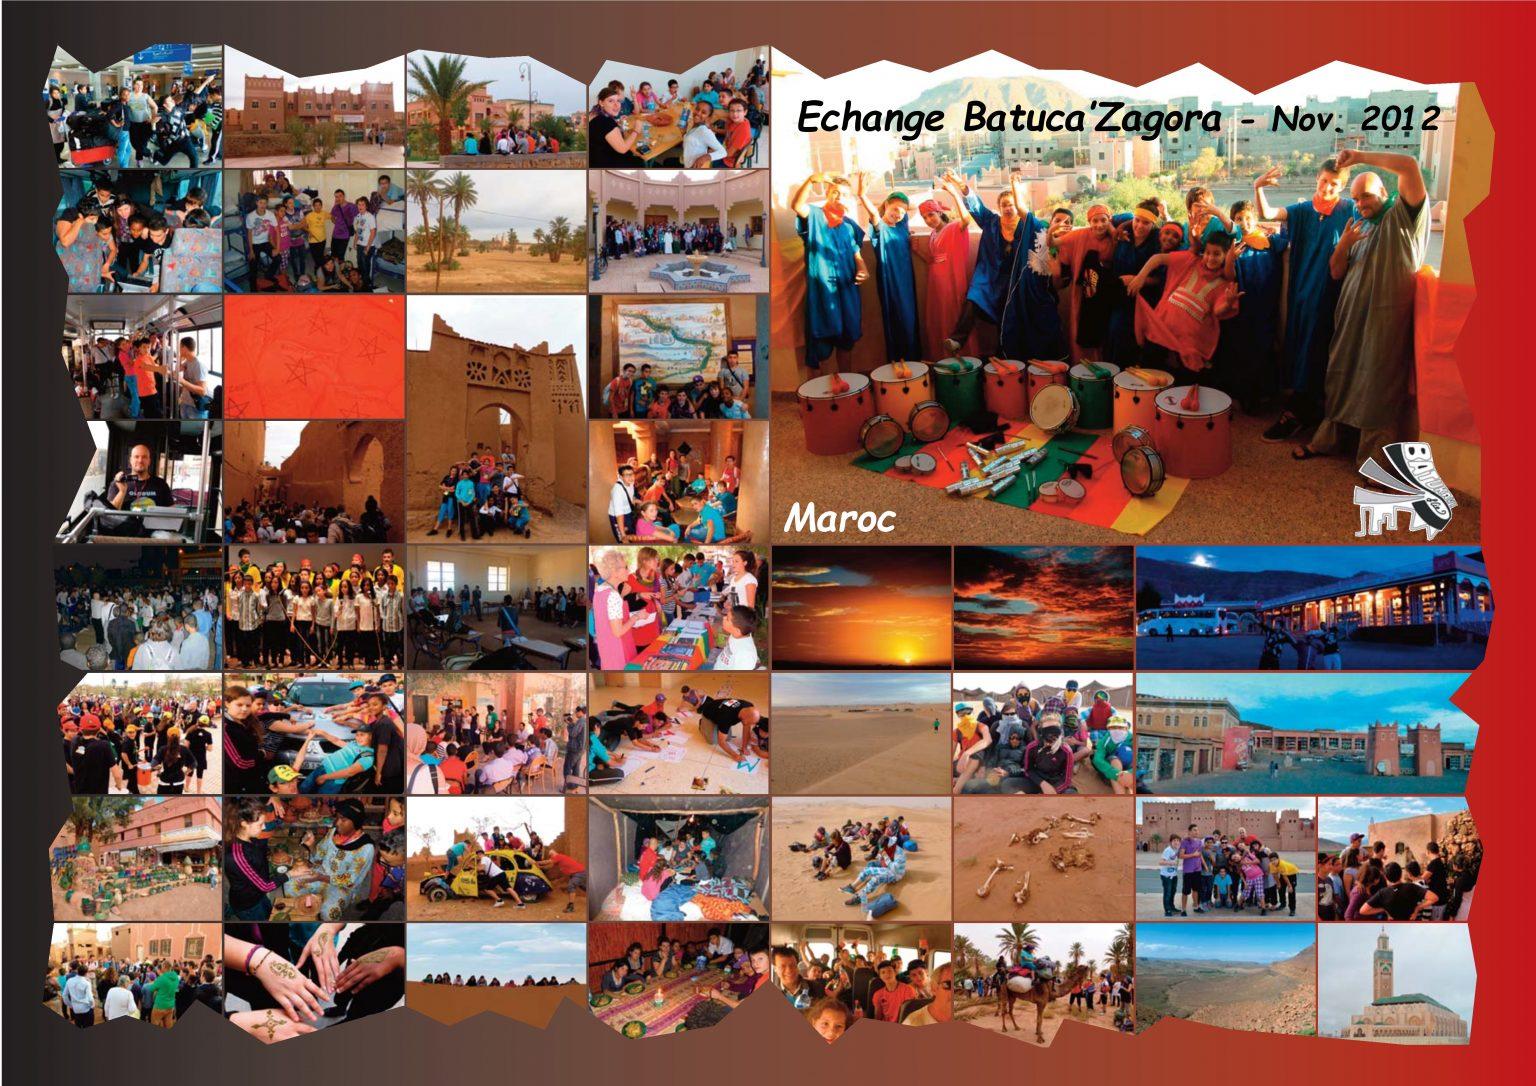 BatukaVI - Panneau Photos 2012-11 Echange Batuca'Zagora (Réduit)